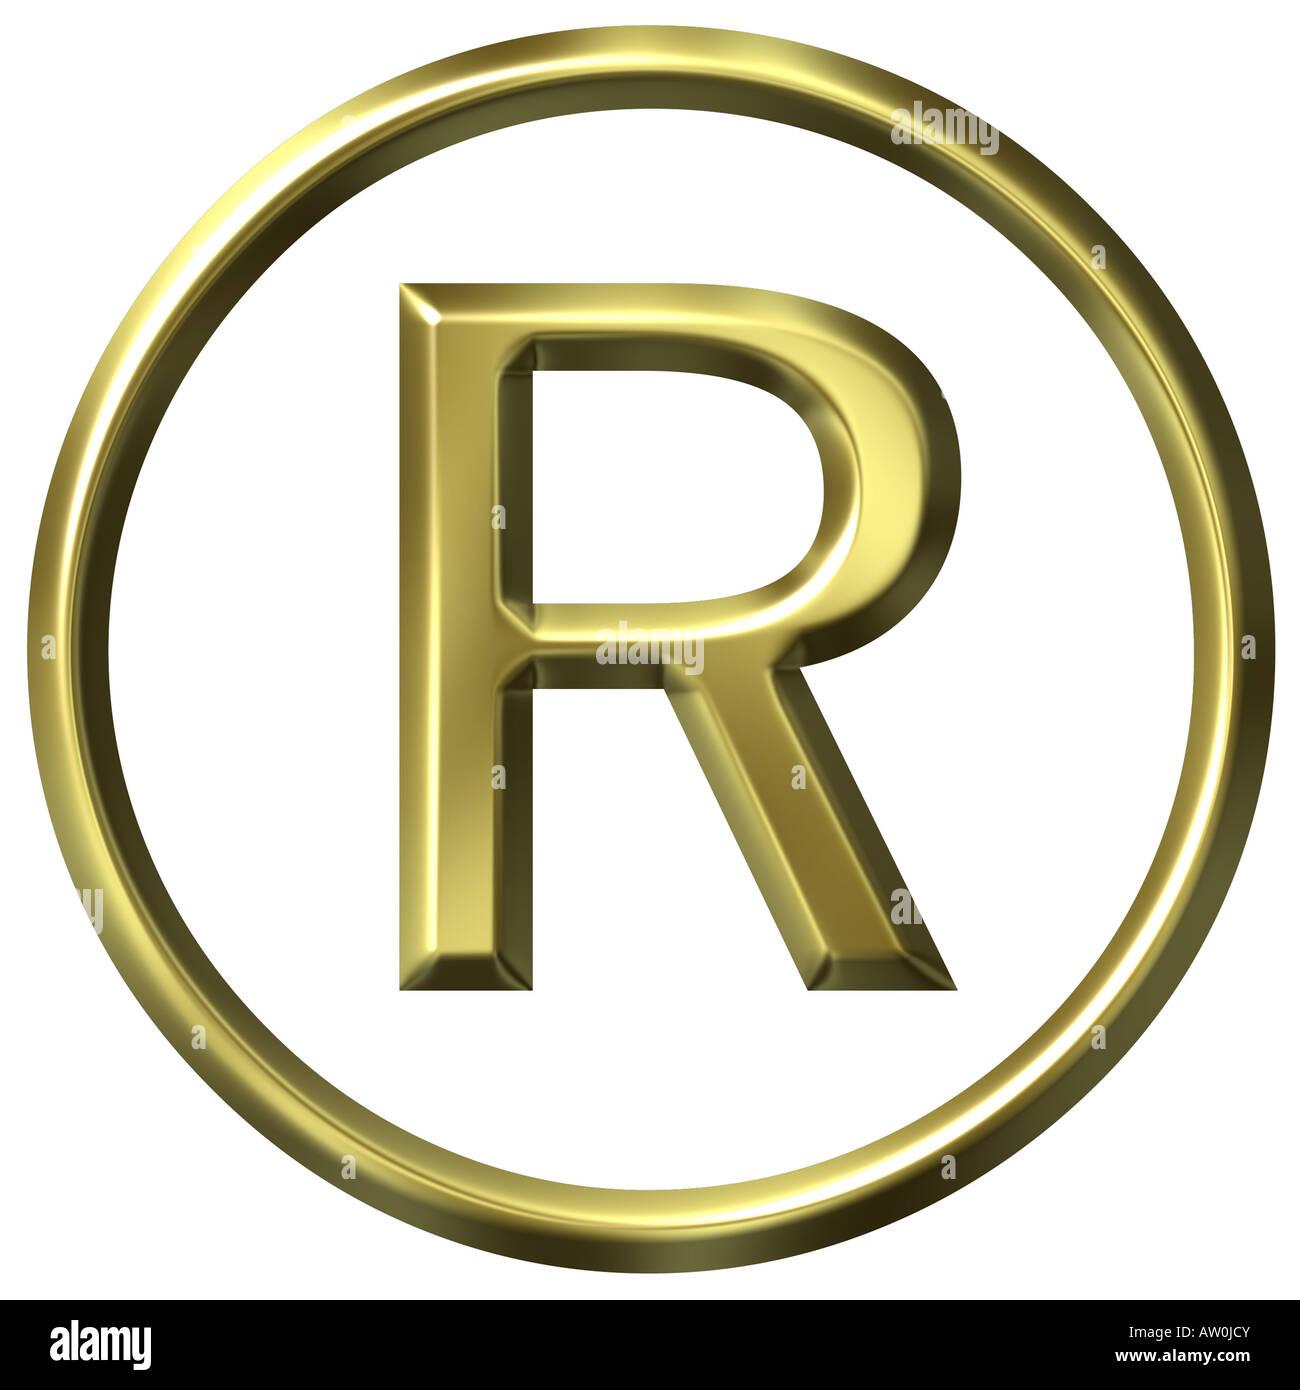 3d golden registered symbol stock photo royalty free image 3d golden registered symbol buycottarizona Gallery